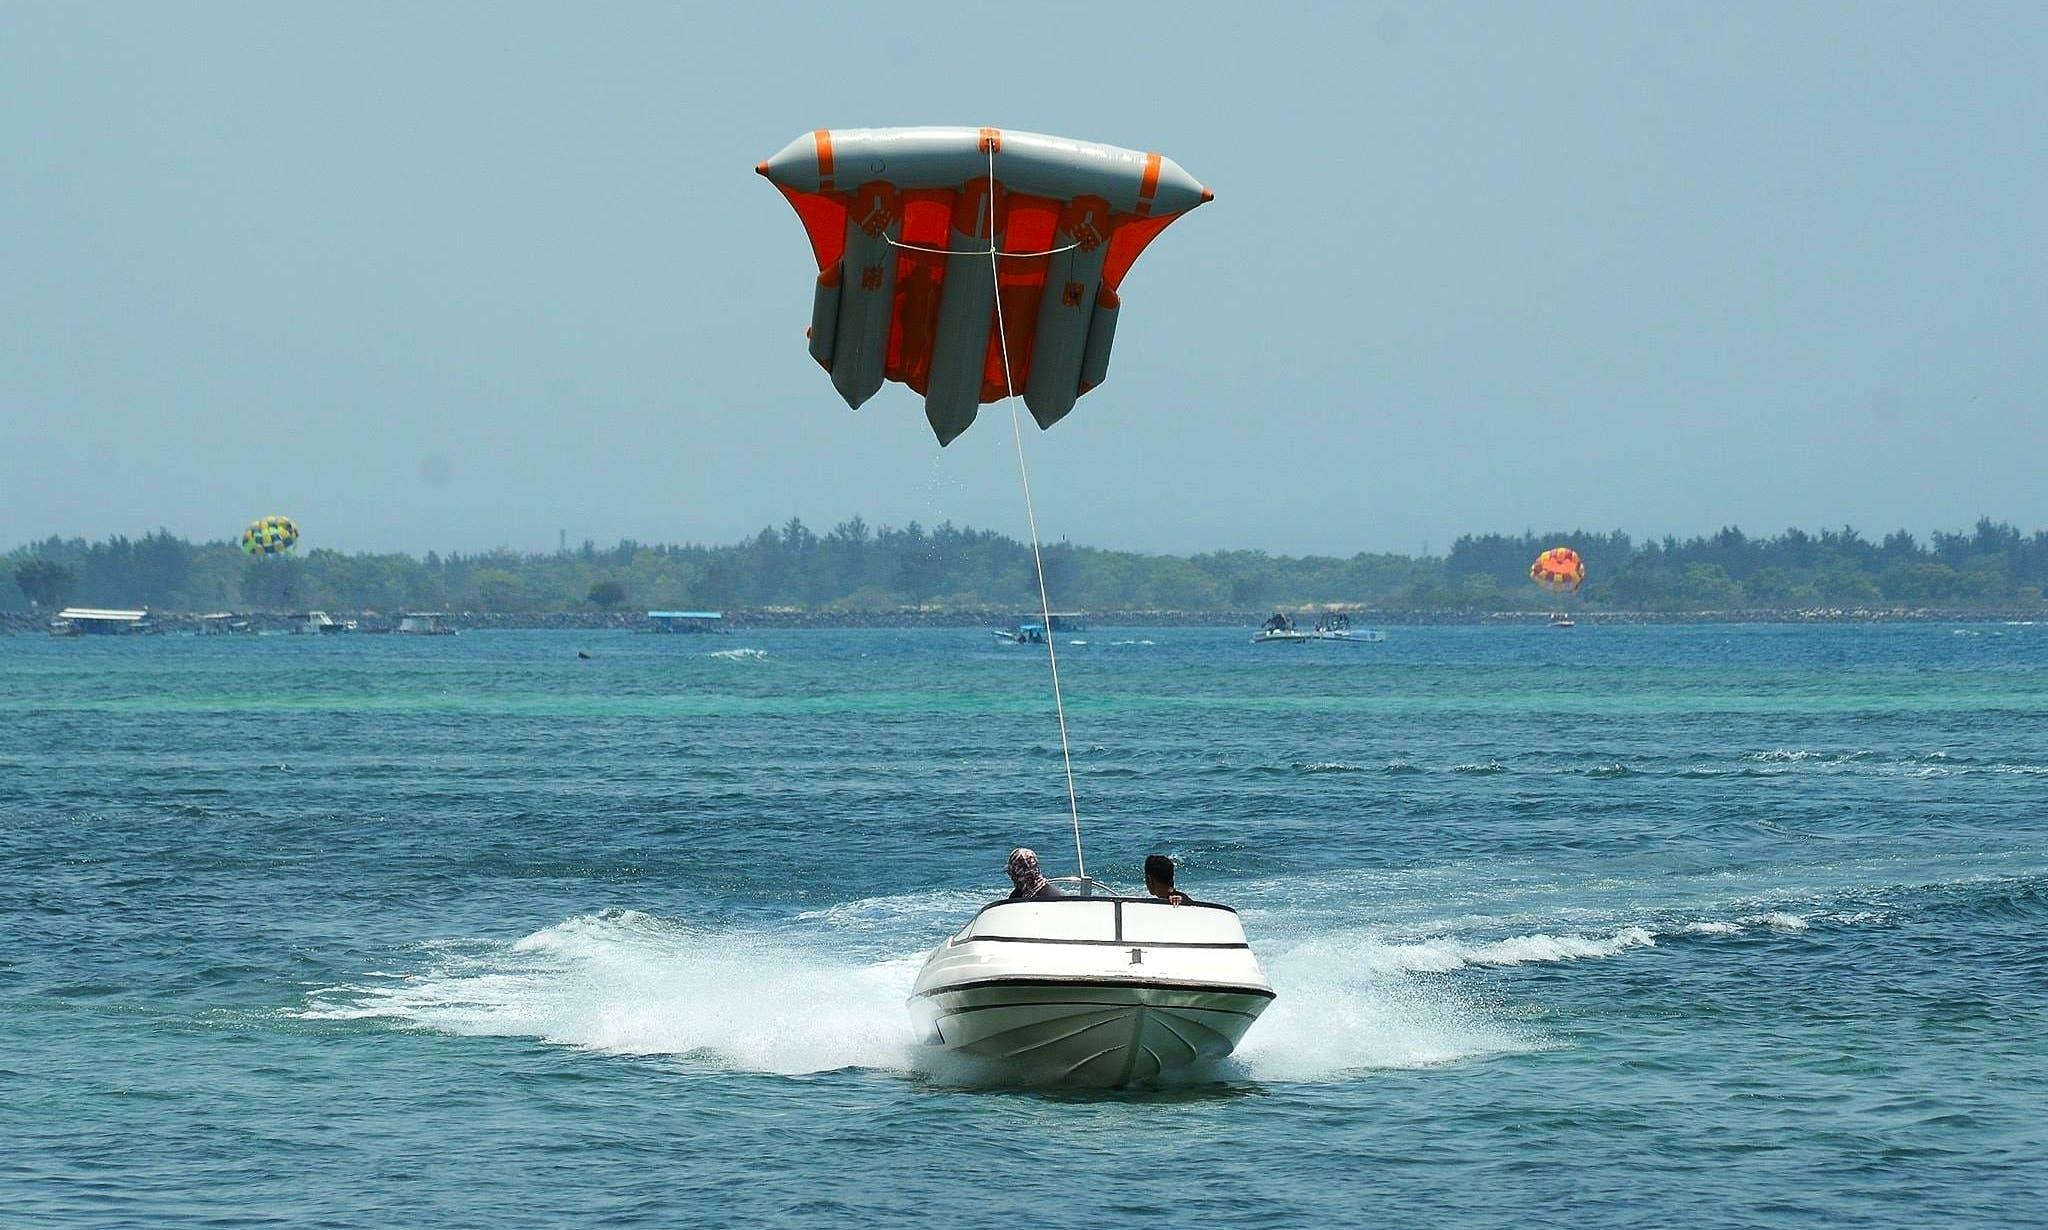 Adrenaline Fly Fish Expereince in Kuta Selatan, Indonesia